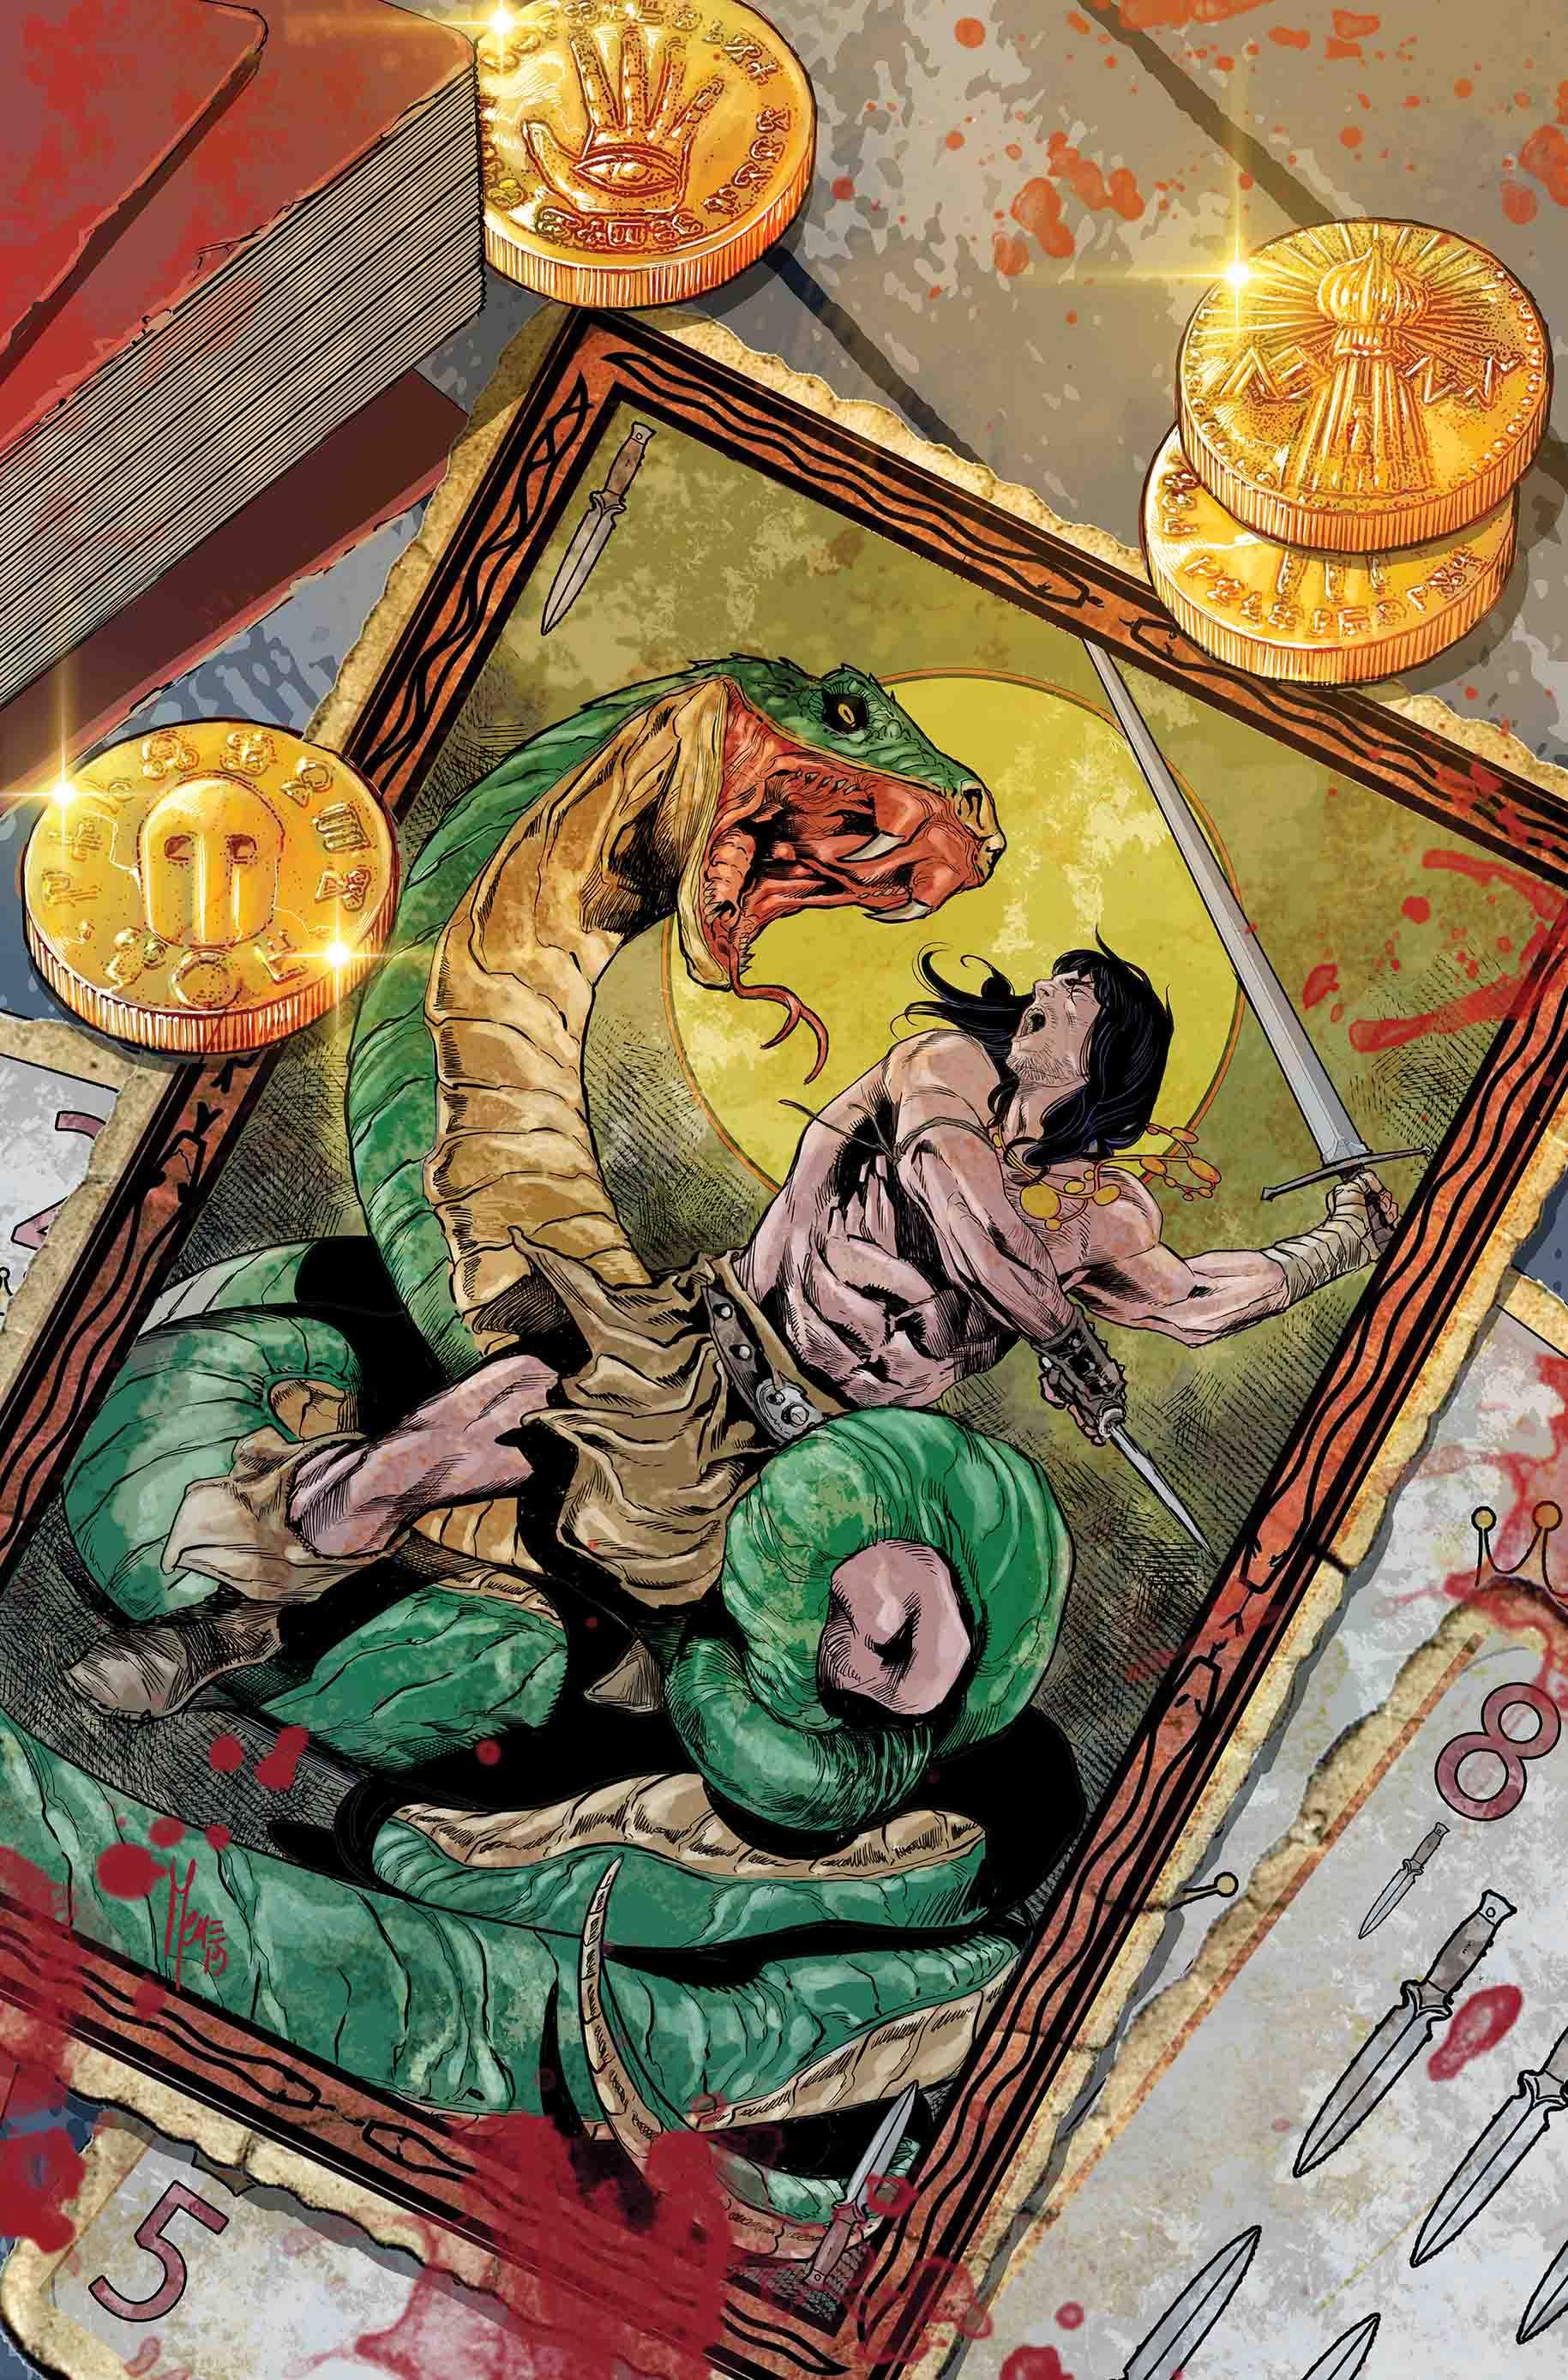 Savage Sword of Conan (2019) #8